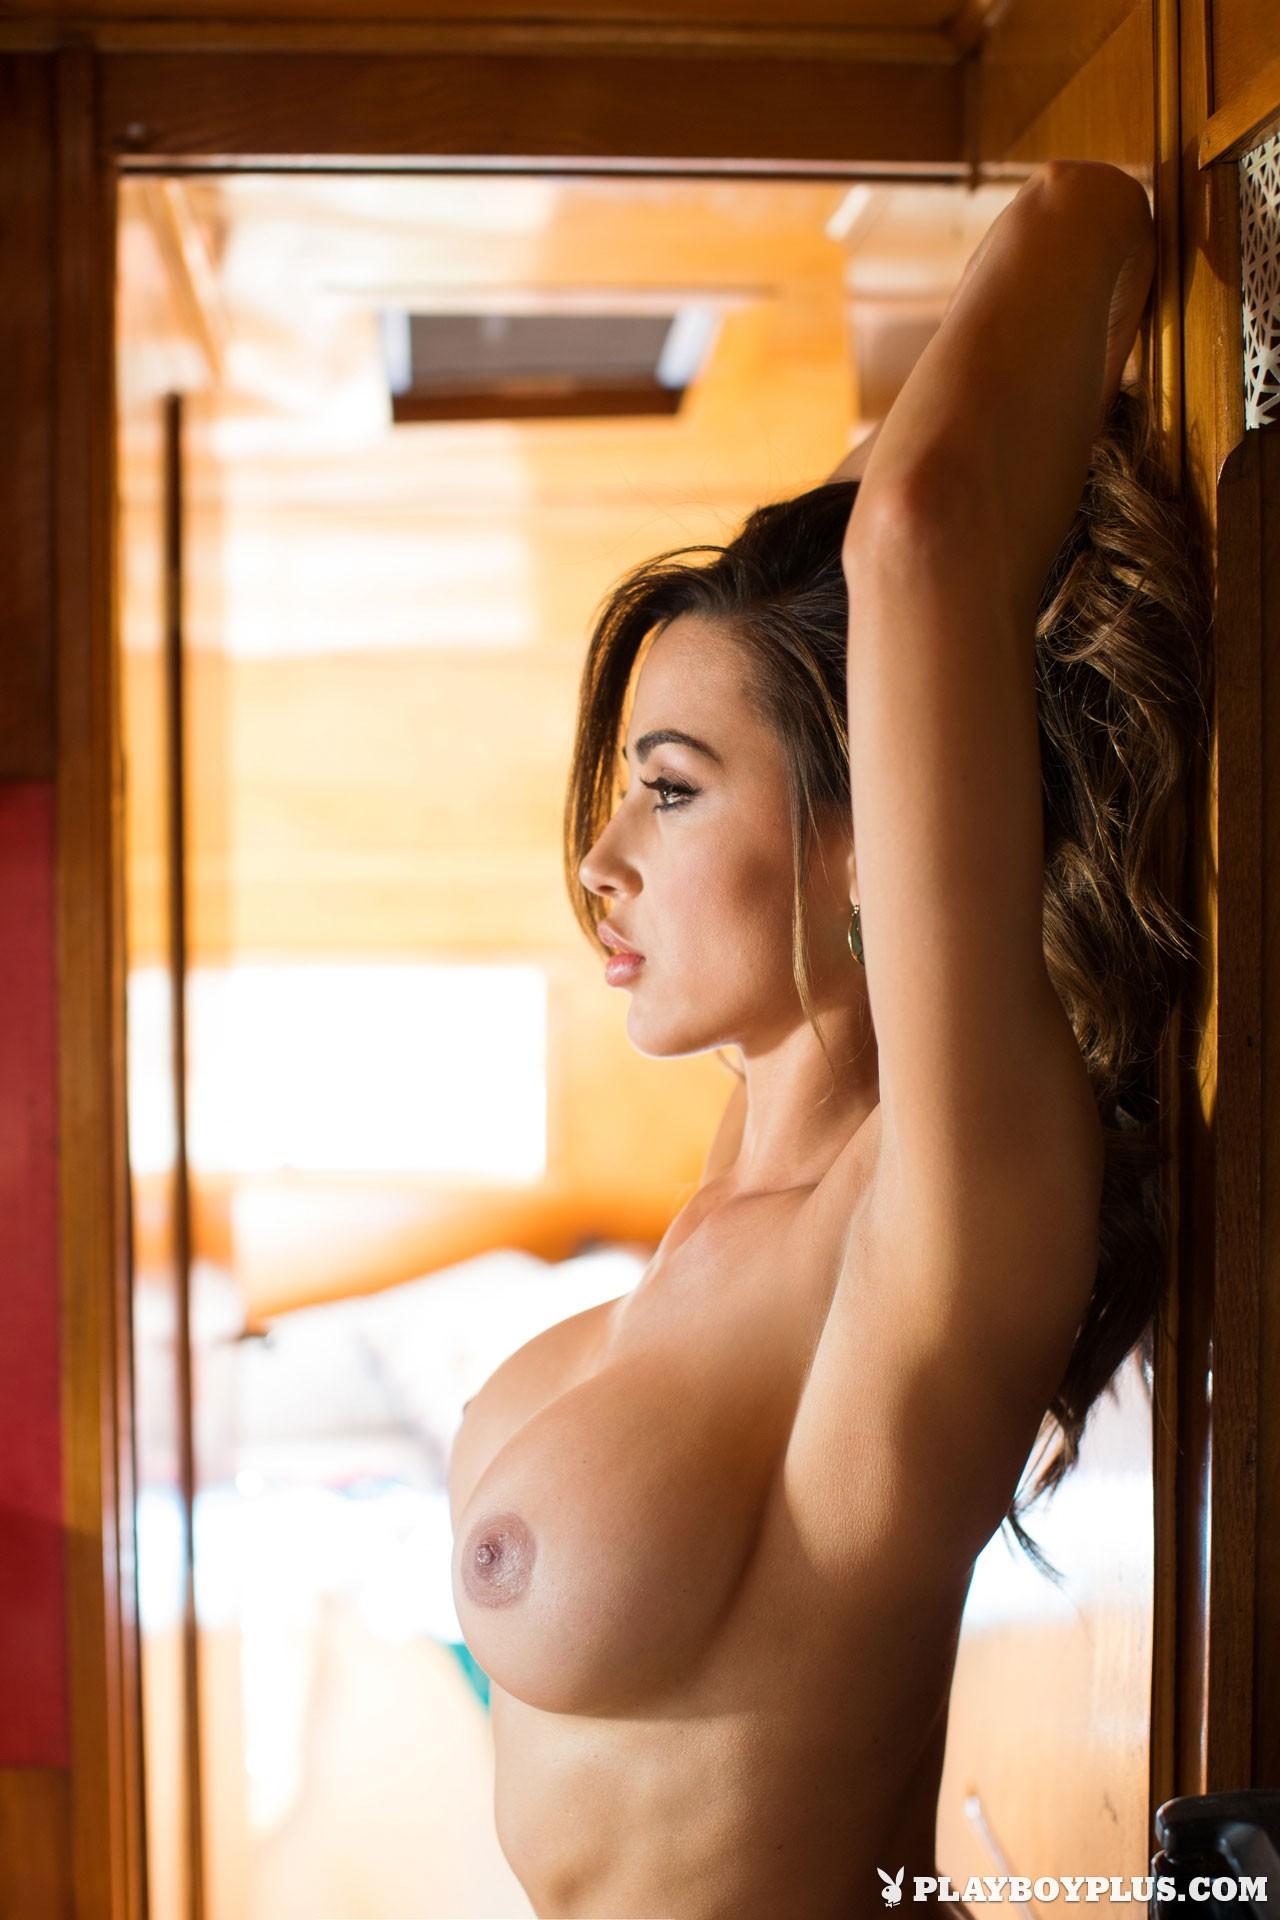 Playboy mobile porn